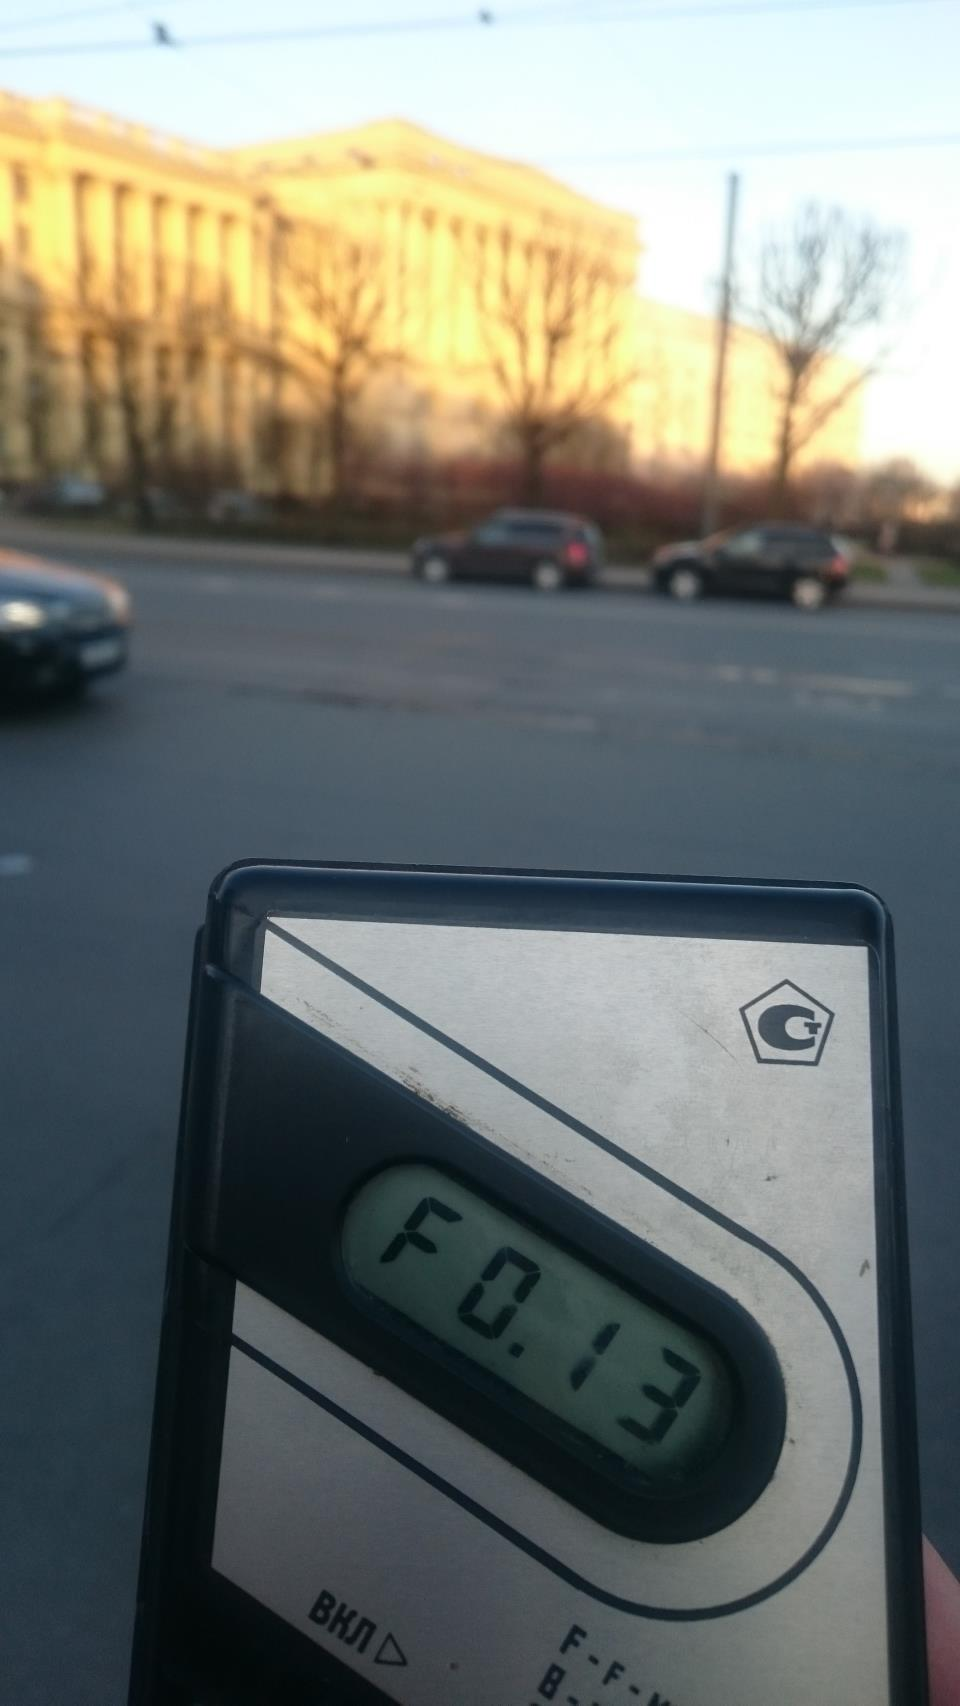 Точка измерения МЭД гамма-излучени на улице Куйбышева у дома 2 в Санкт-Петербурге